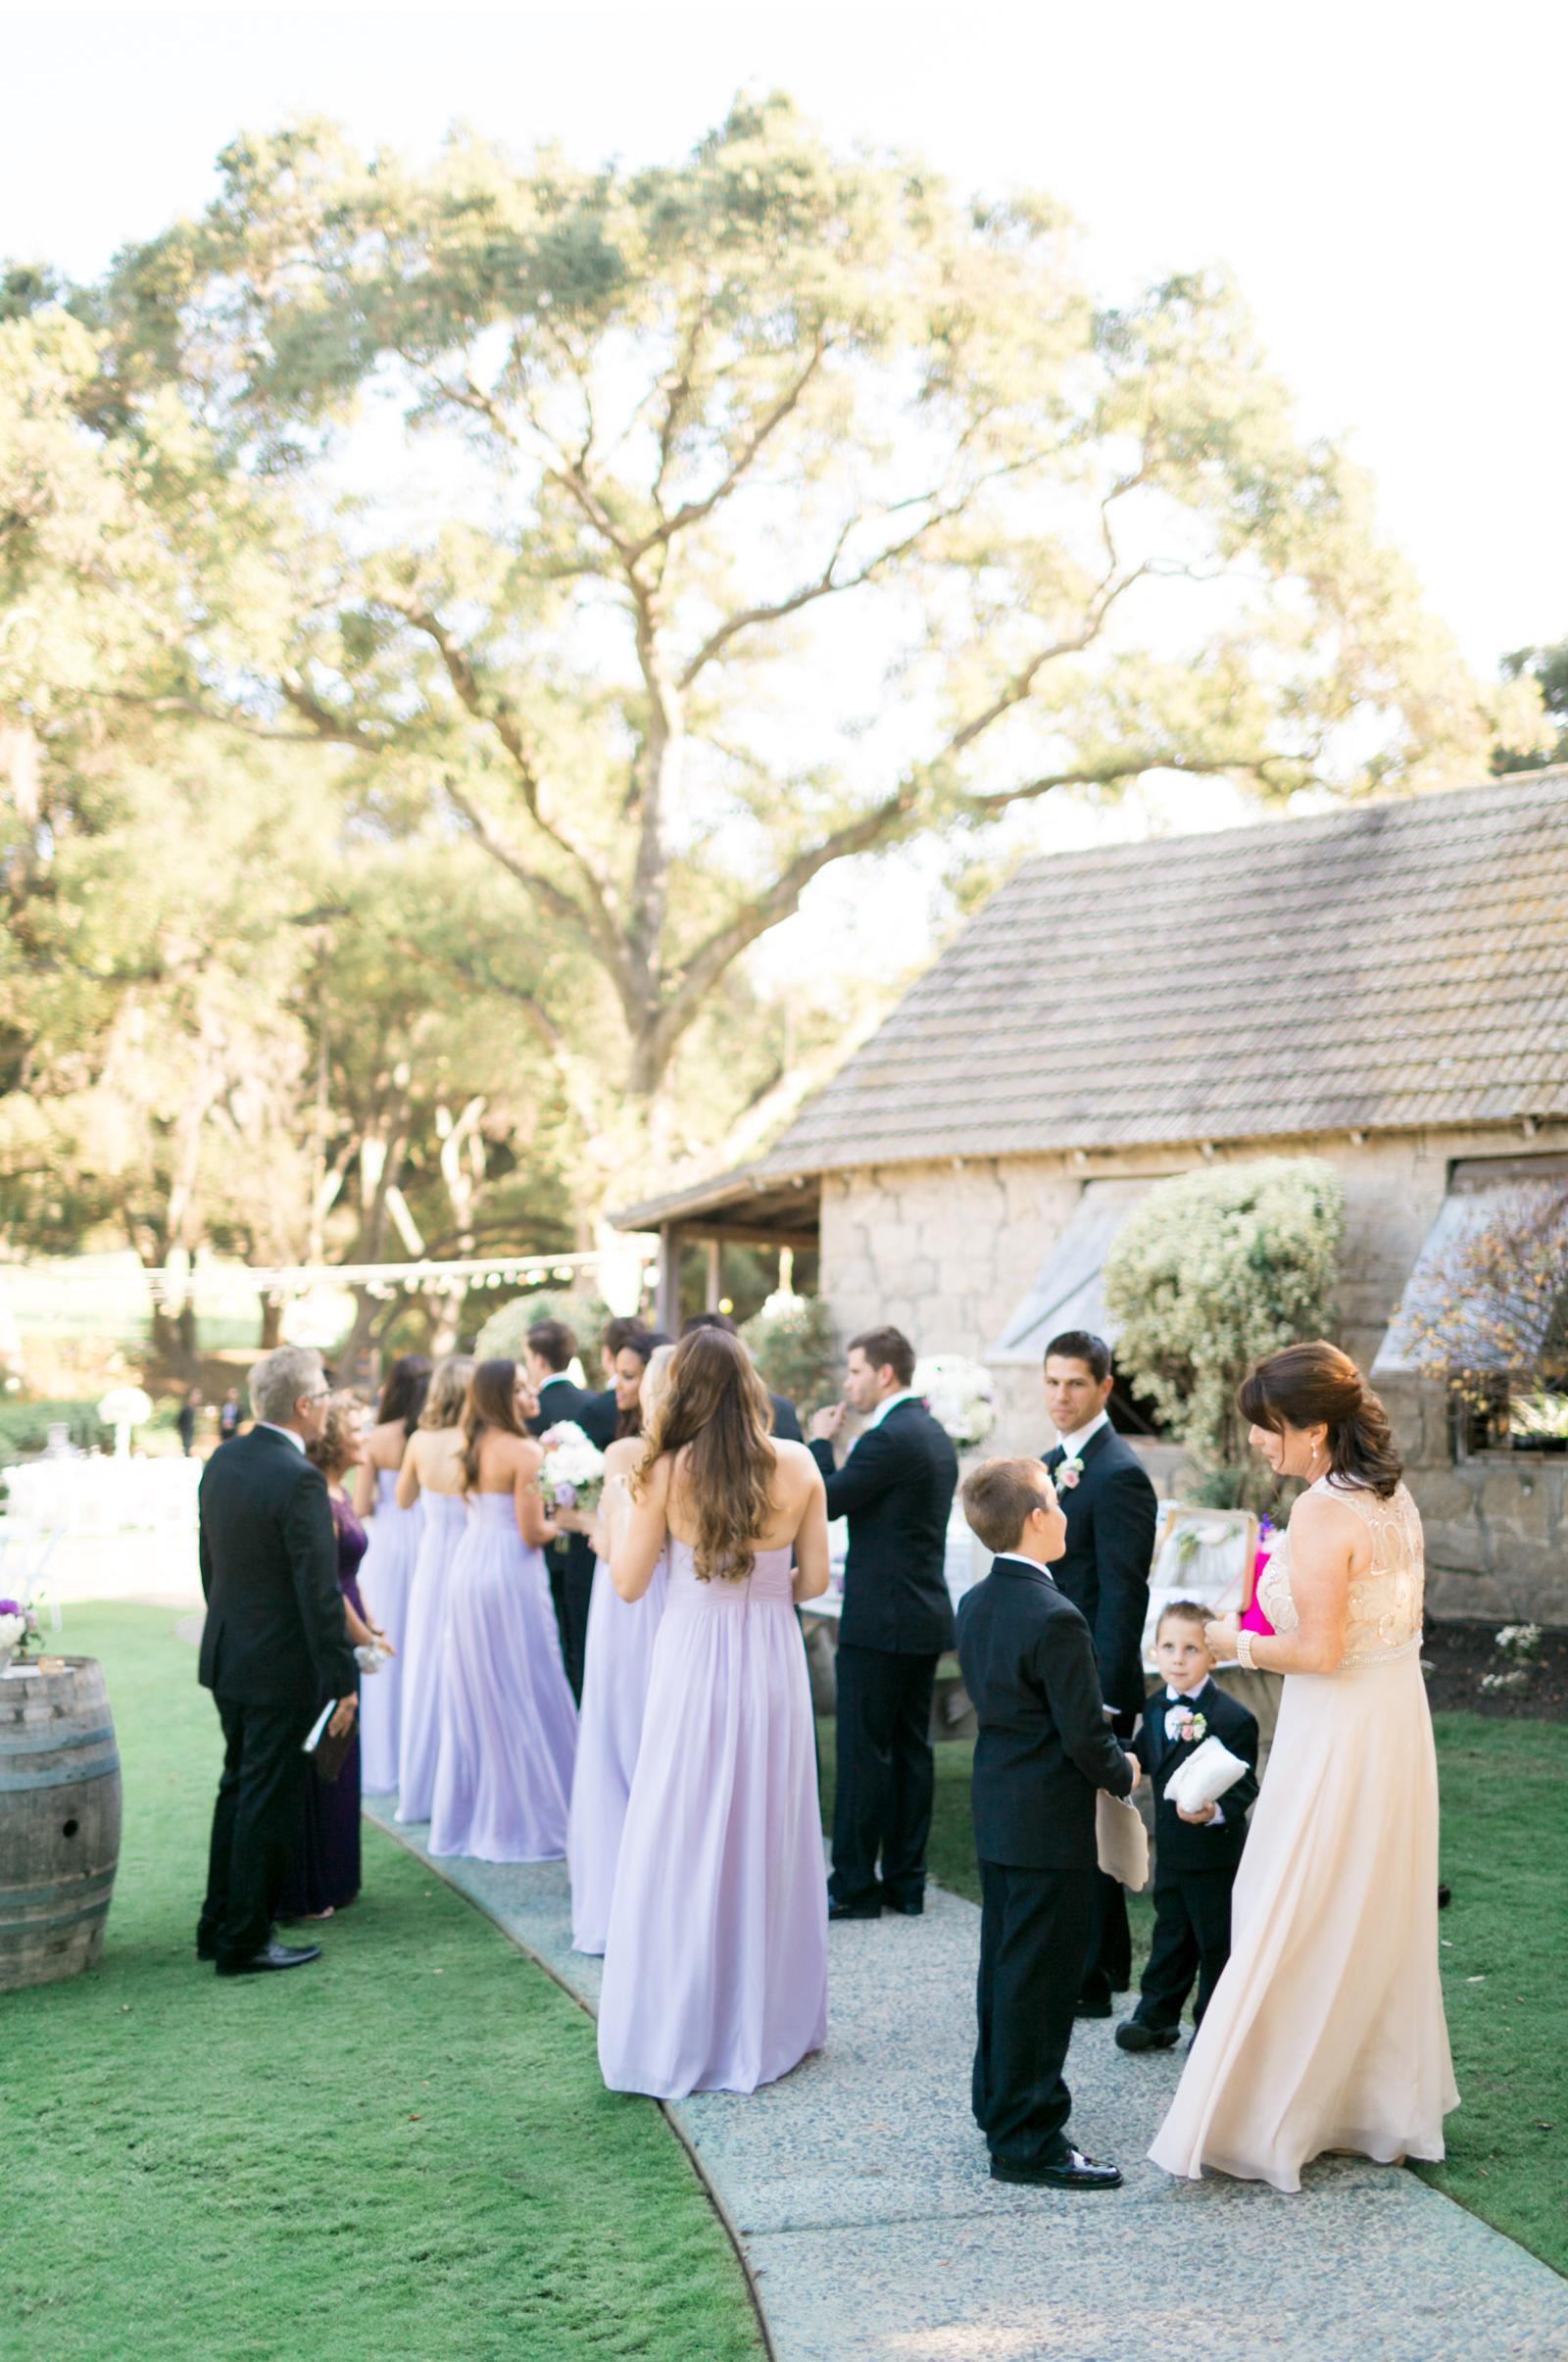 Nia-Sanchez-Wedding-First-Touch-Prayer-Natalie-Schutt-Photography_04.jpg